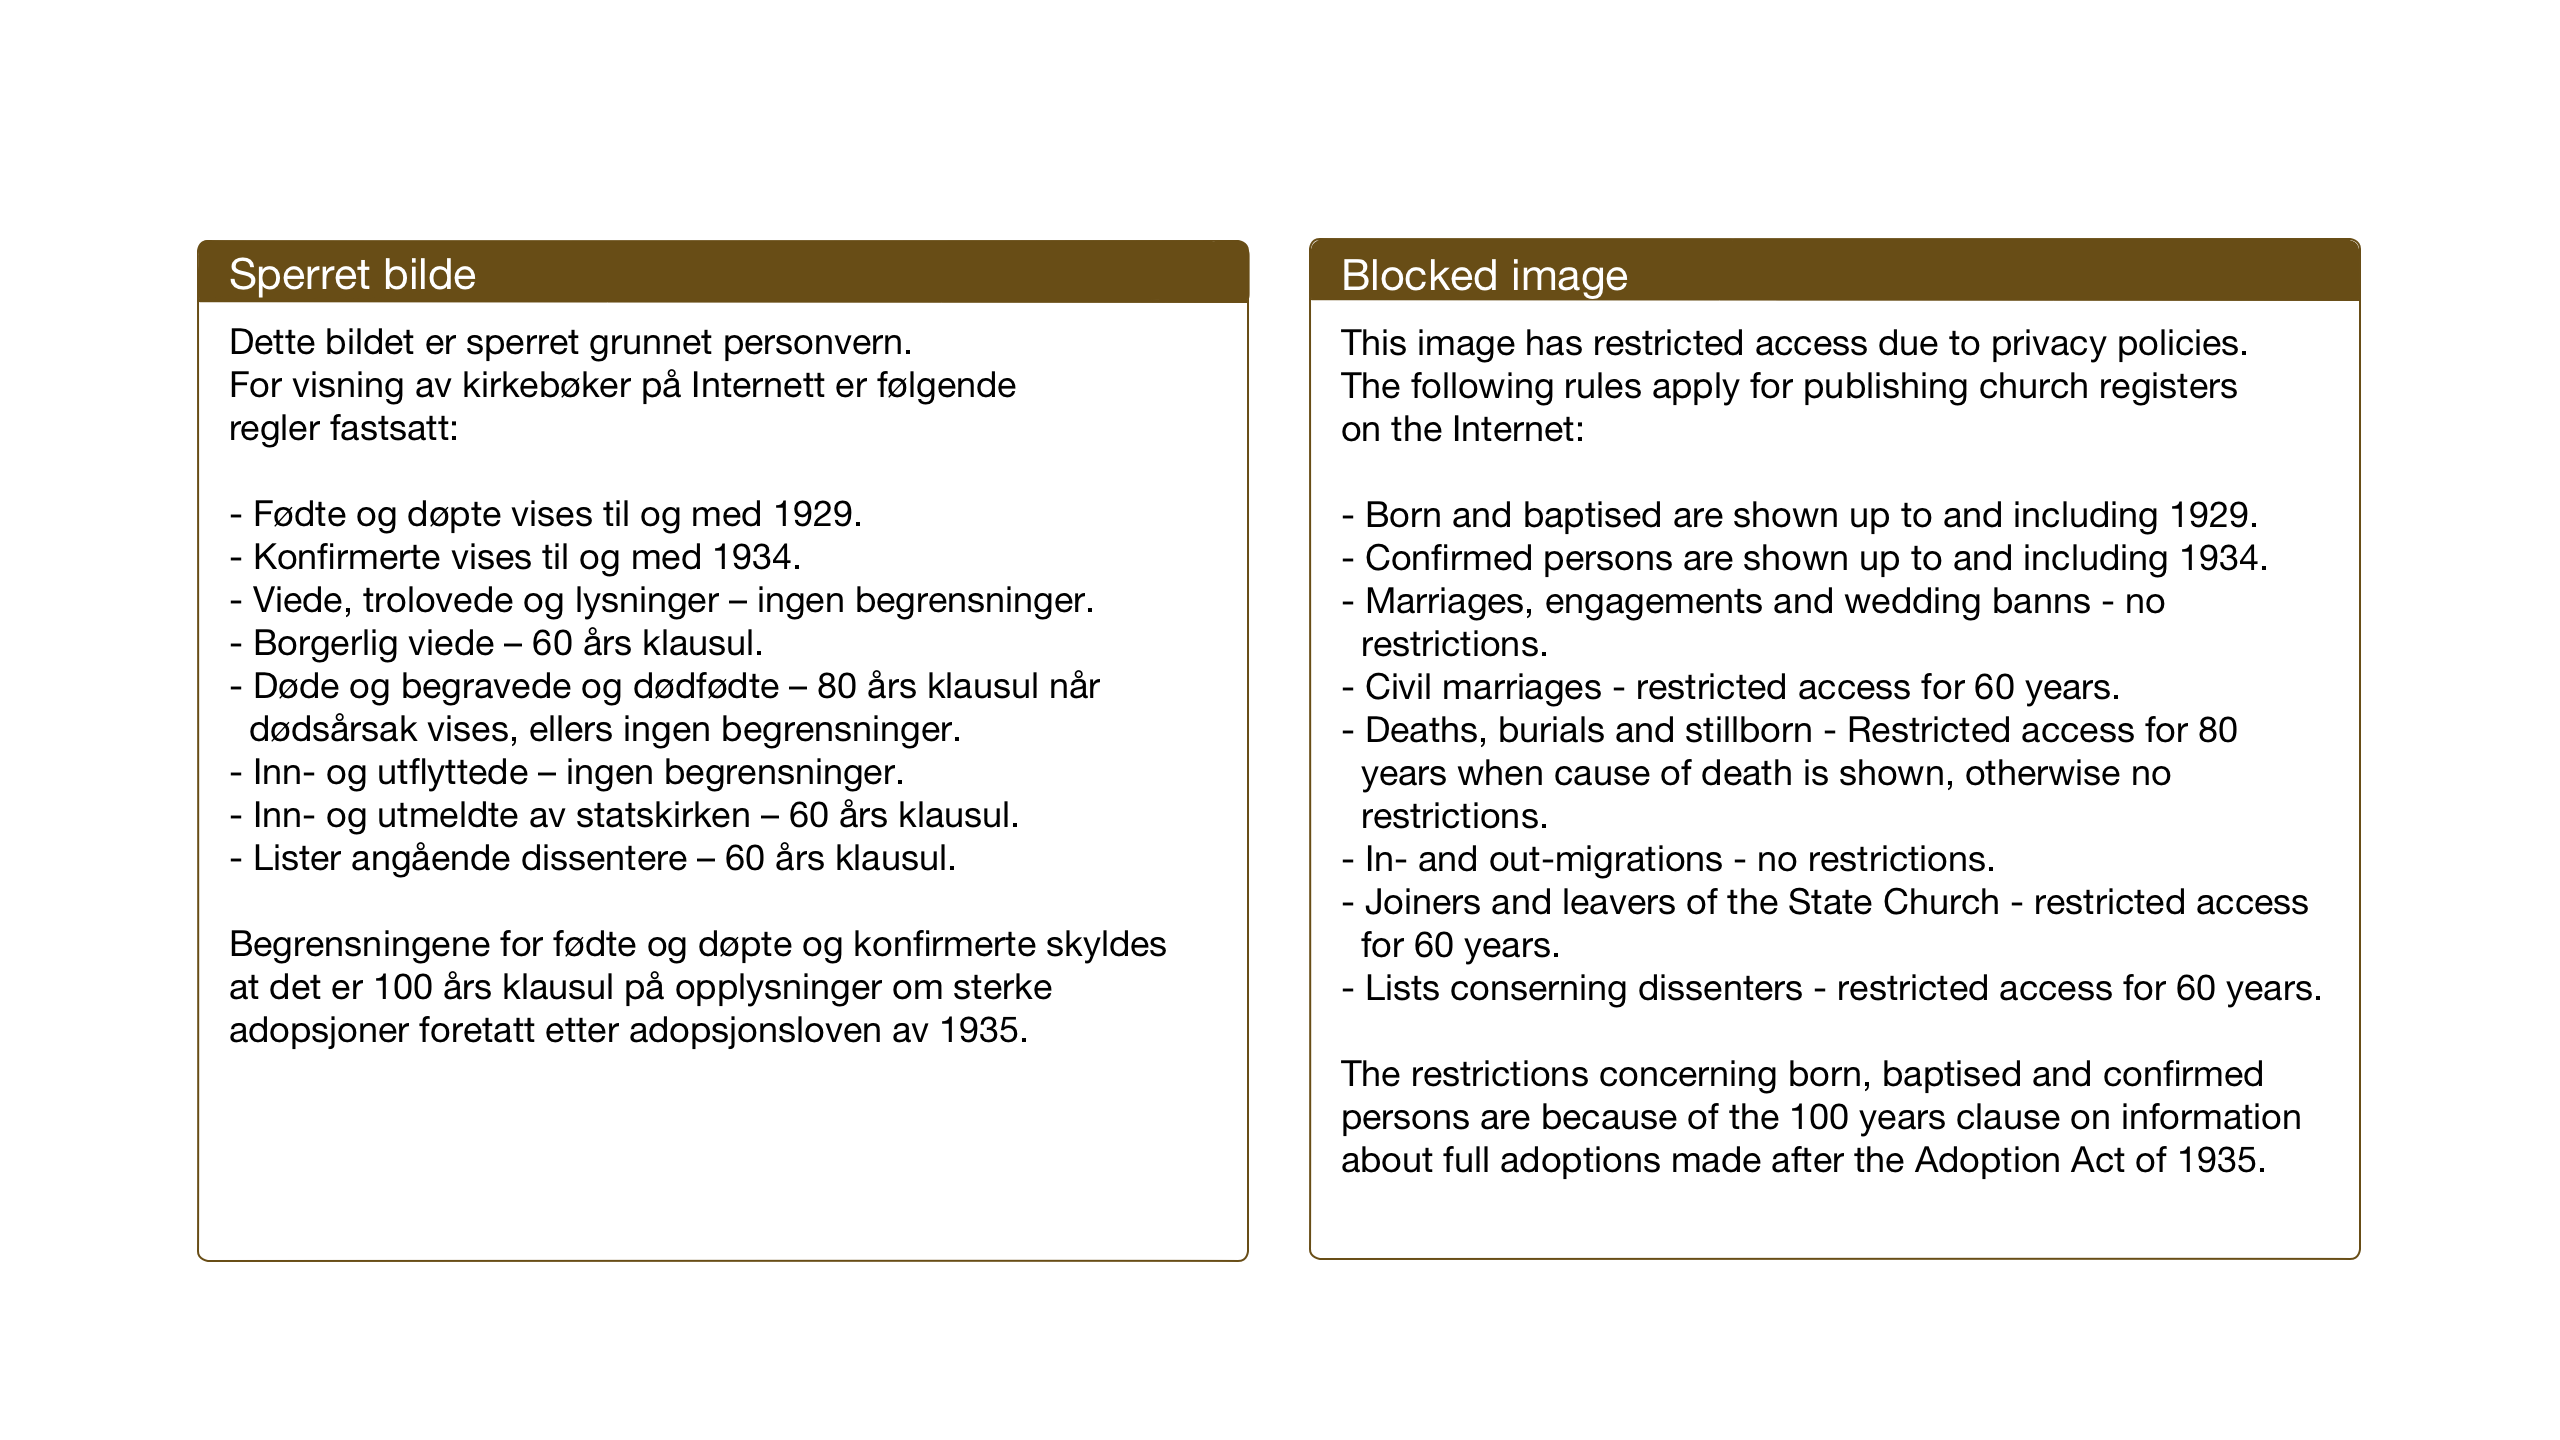 SAH, Vardal prestekontor, H/Ha/Haa/L0018: Ministerialbok nr. 18, 1930-1945, s. 49